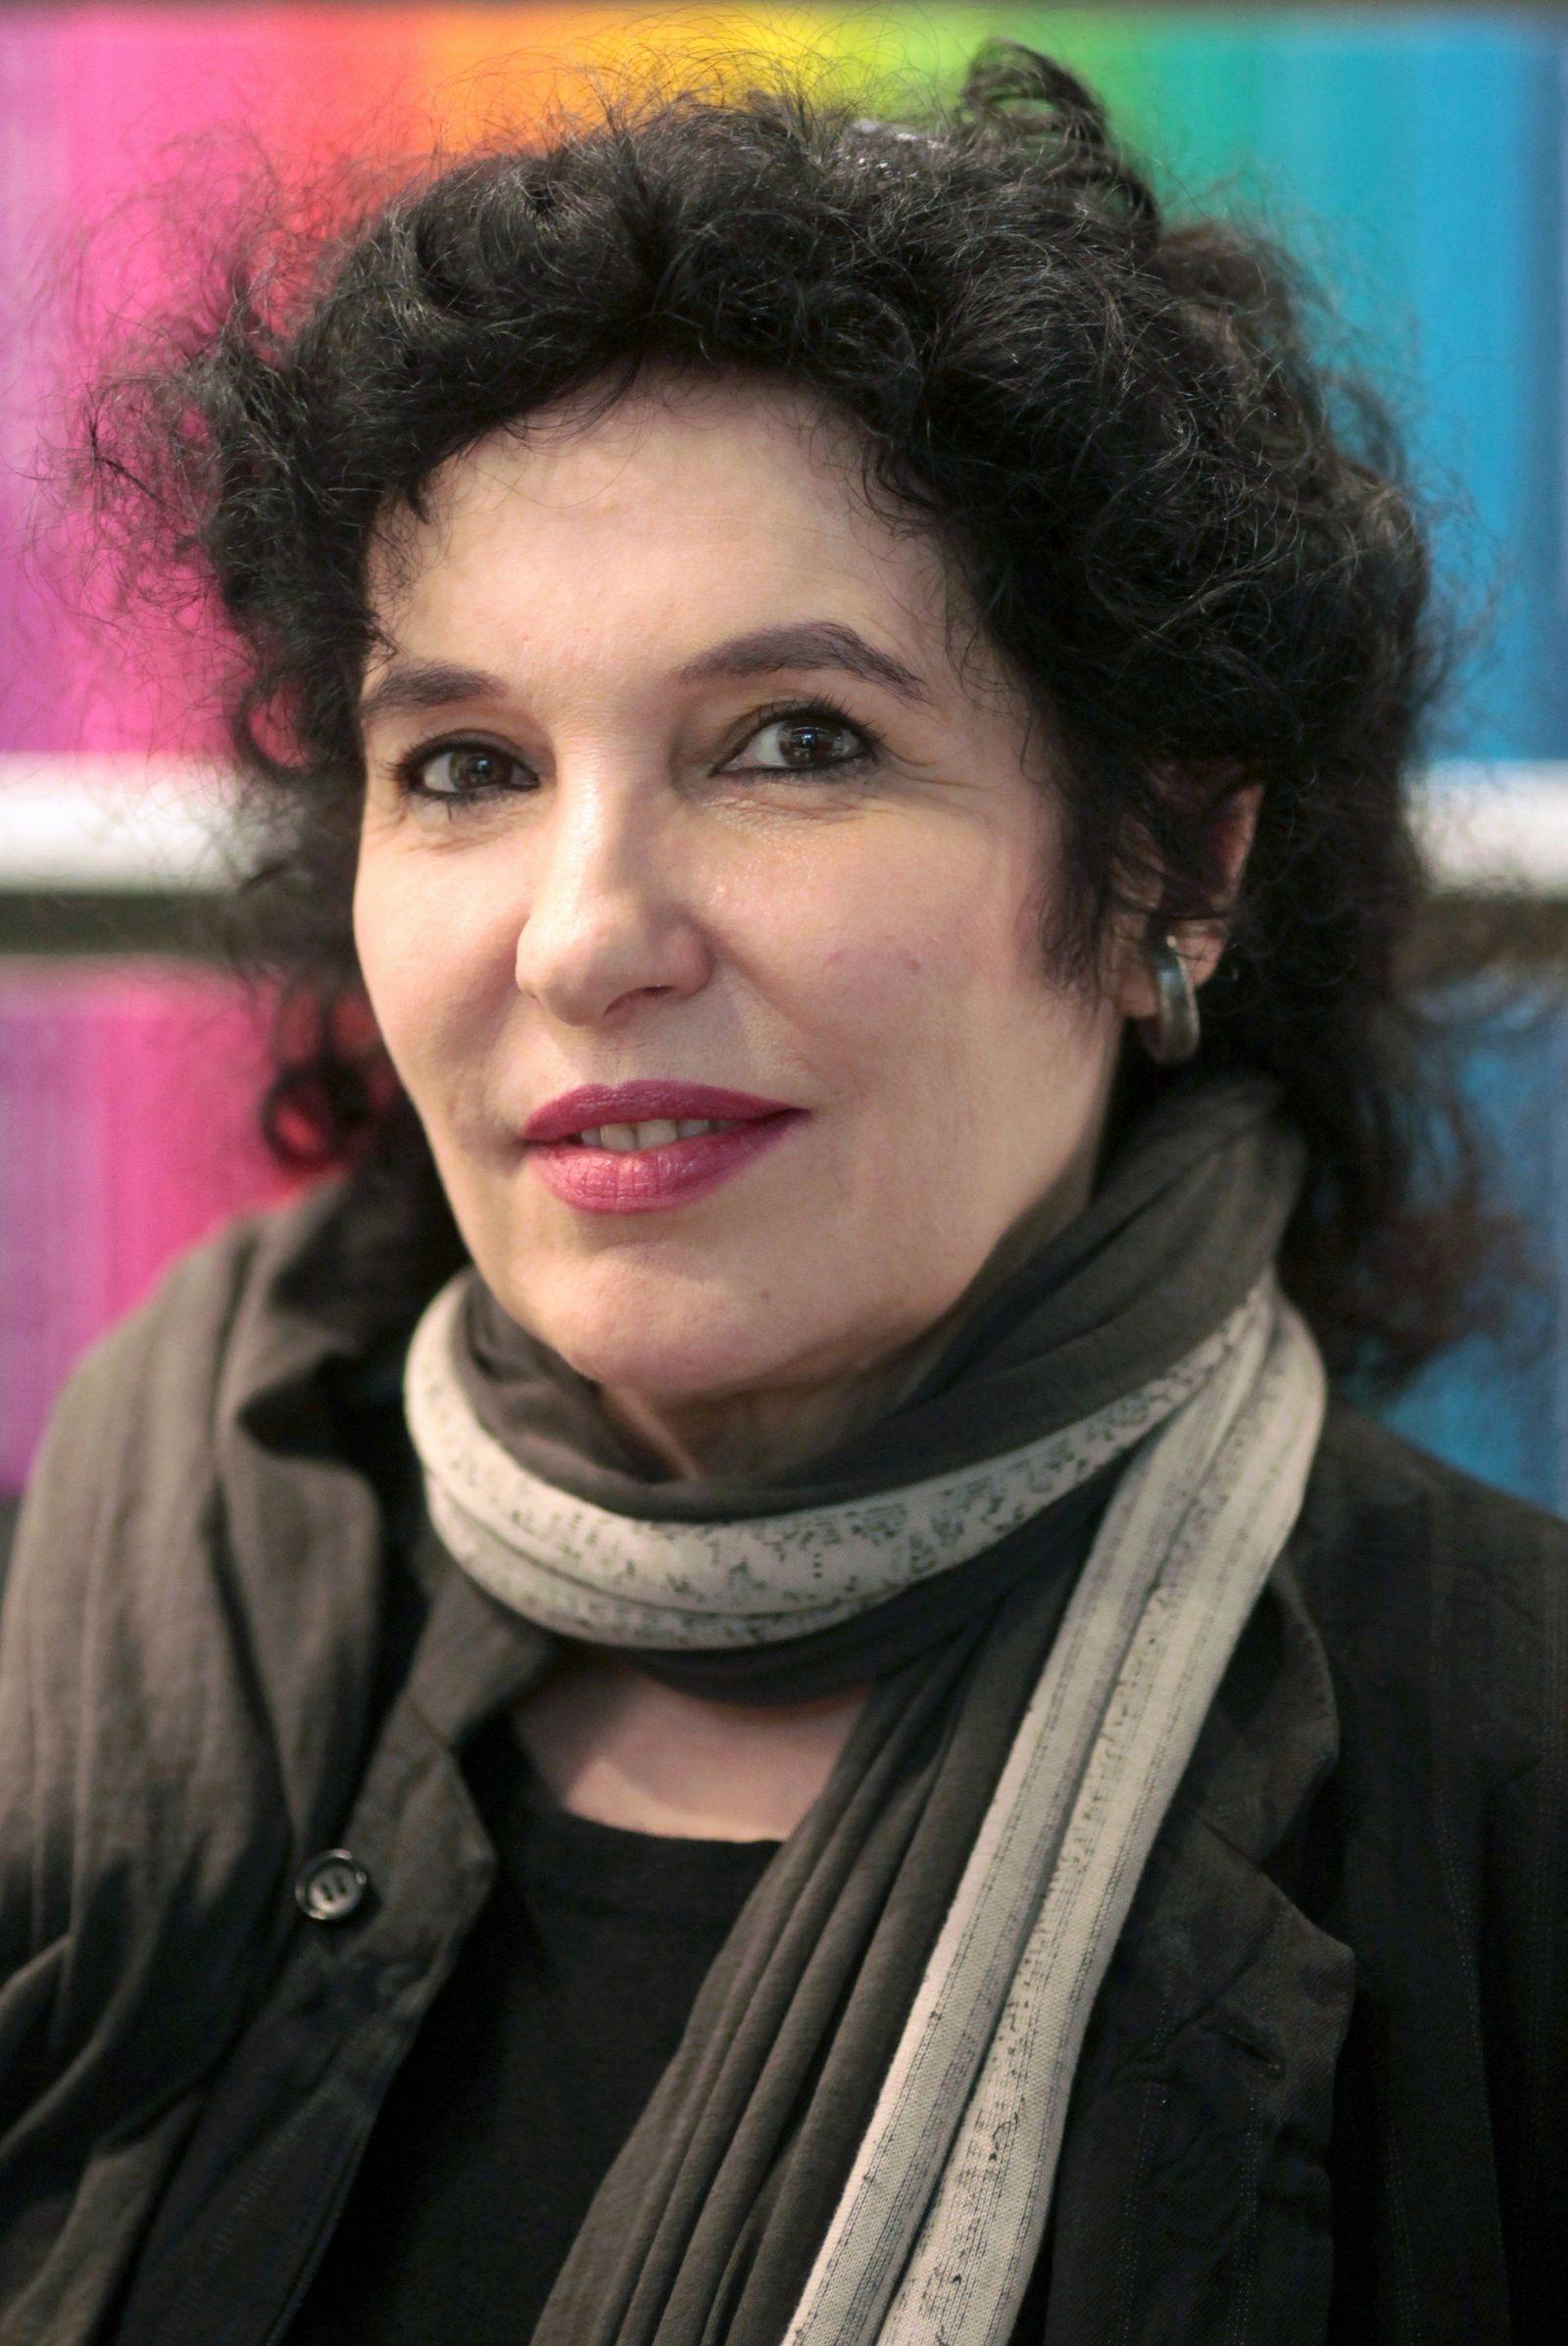 Ulla Unseld-Berkéwicz